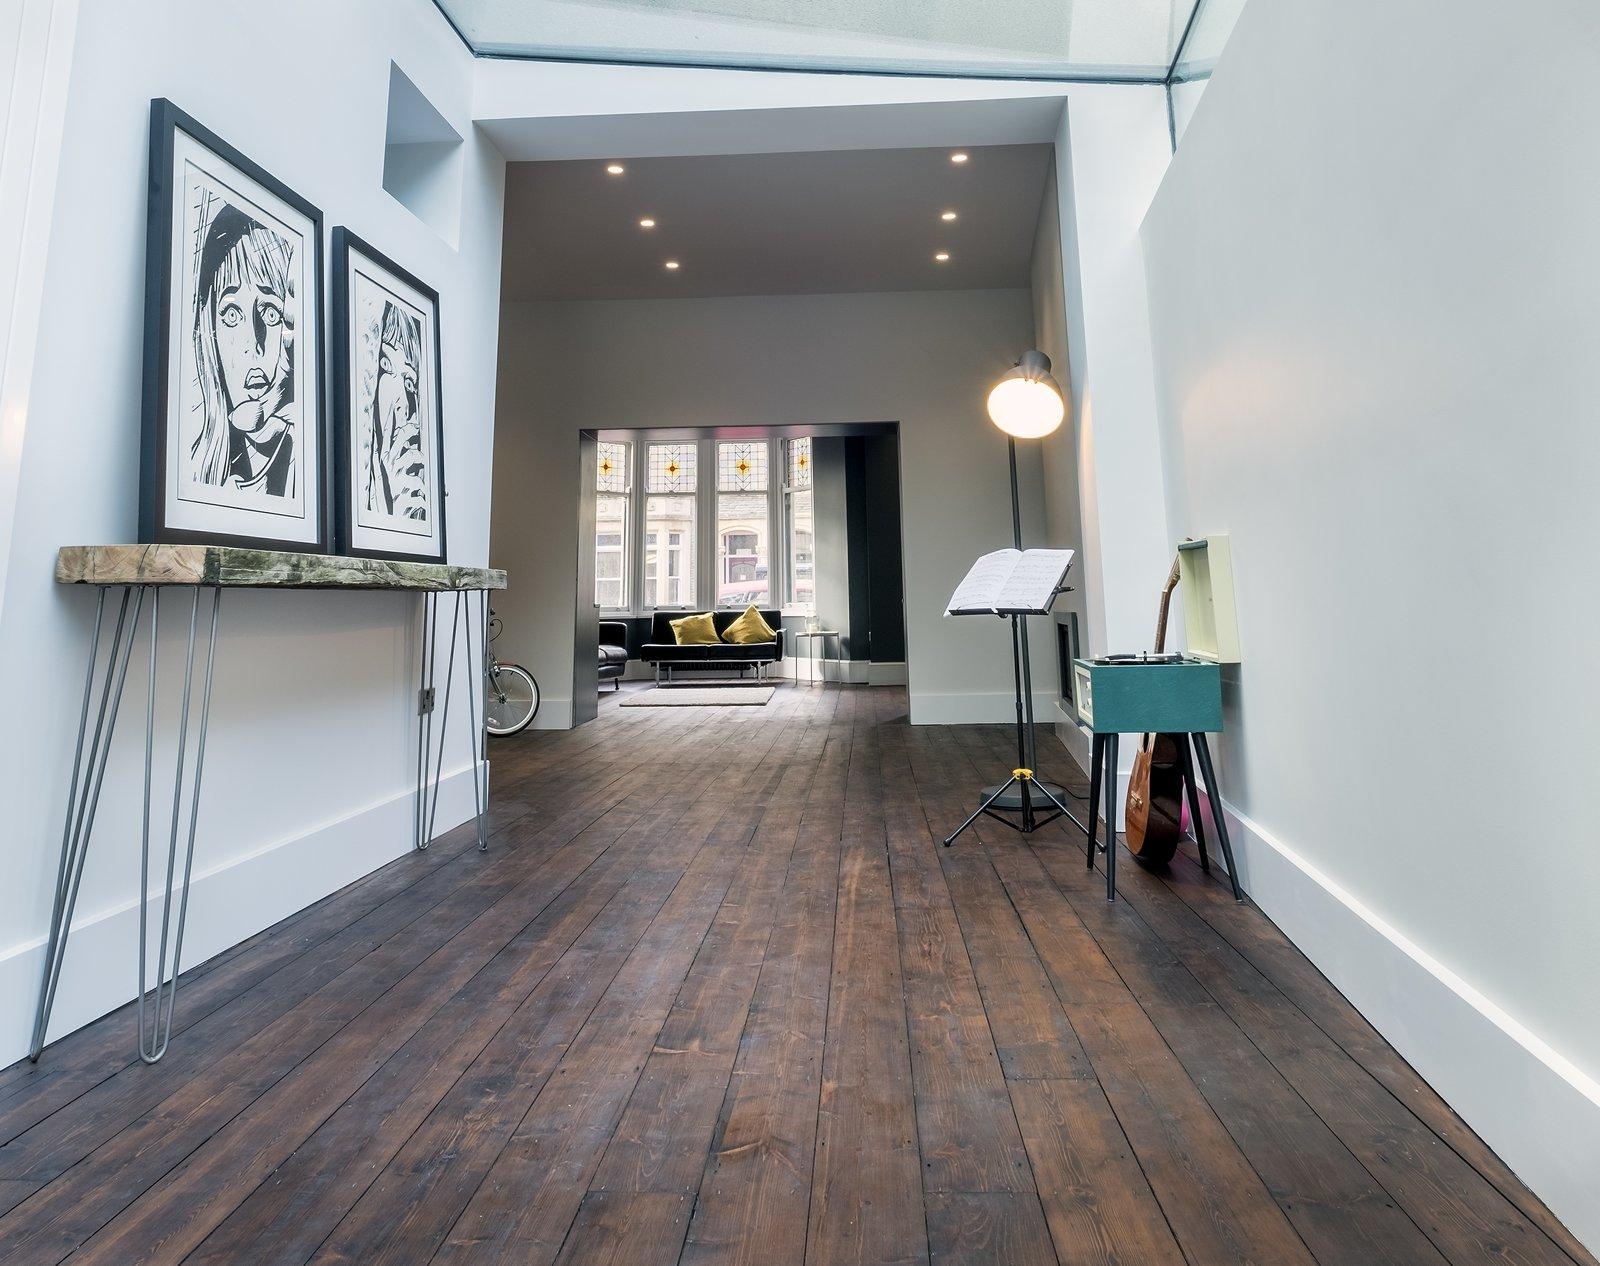 Living Room, Dark Hardwood Floor, Console Tables, Ceiling Lighting, Sofa, and Floor Lighting  THE GLASSHOUSE